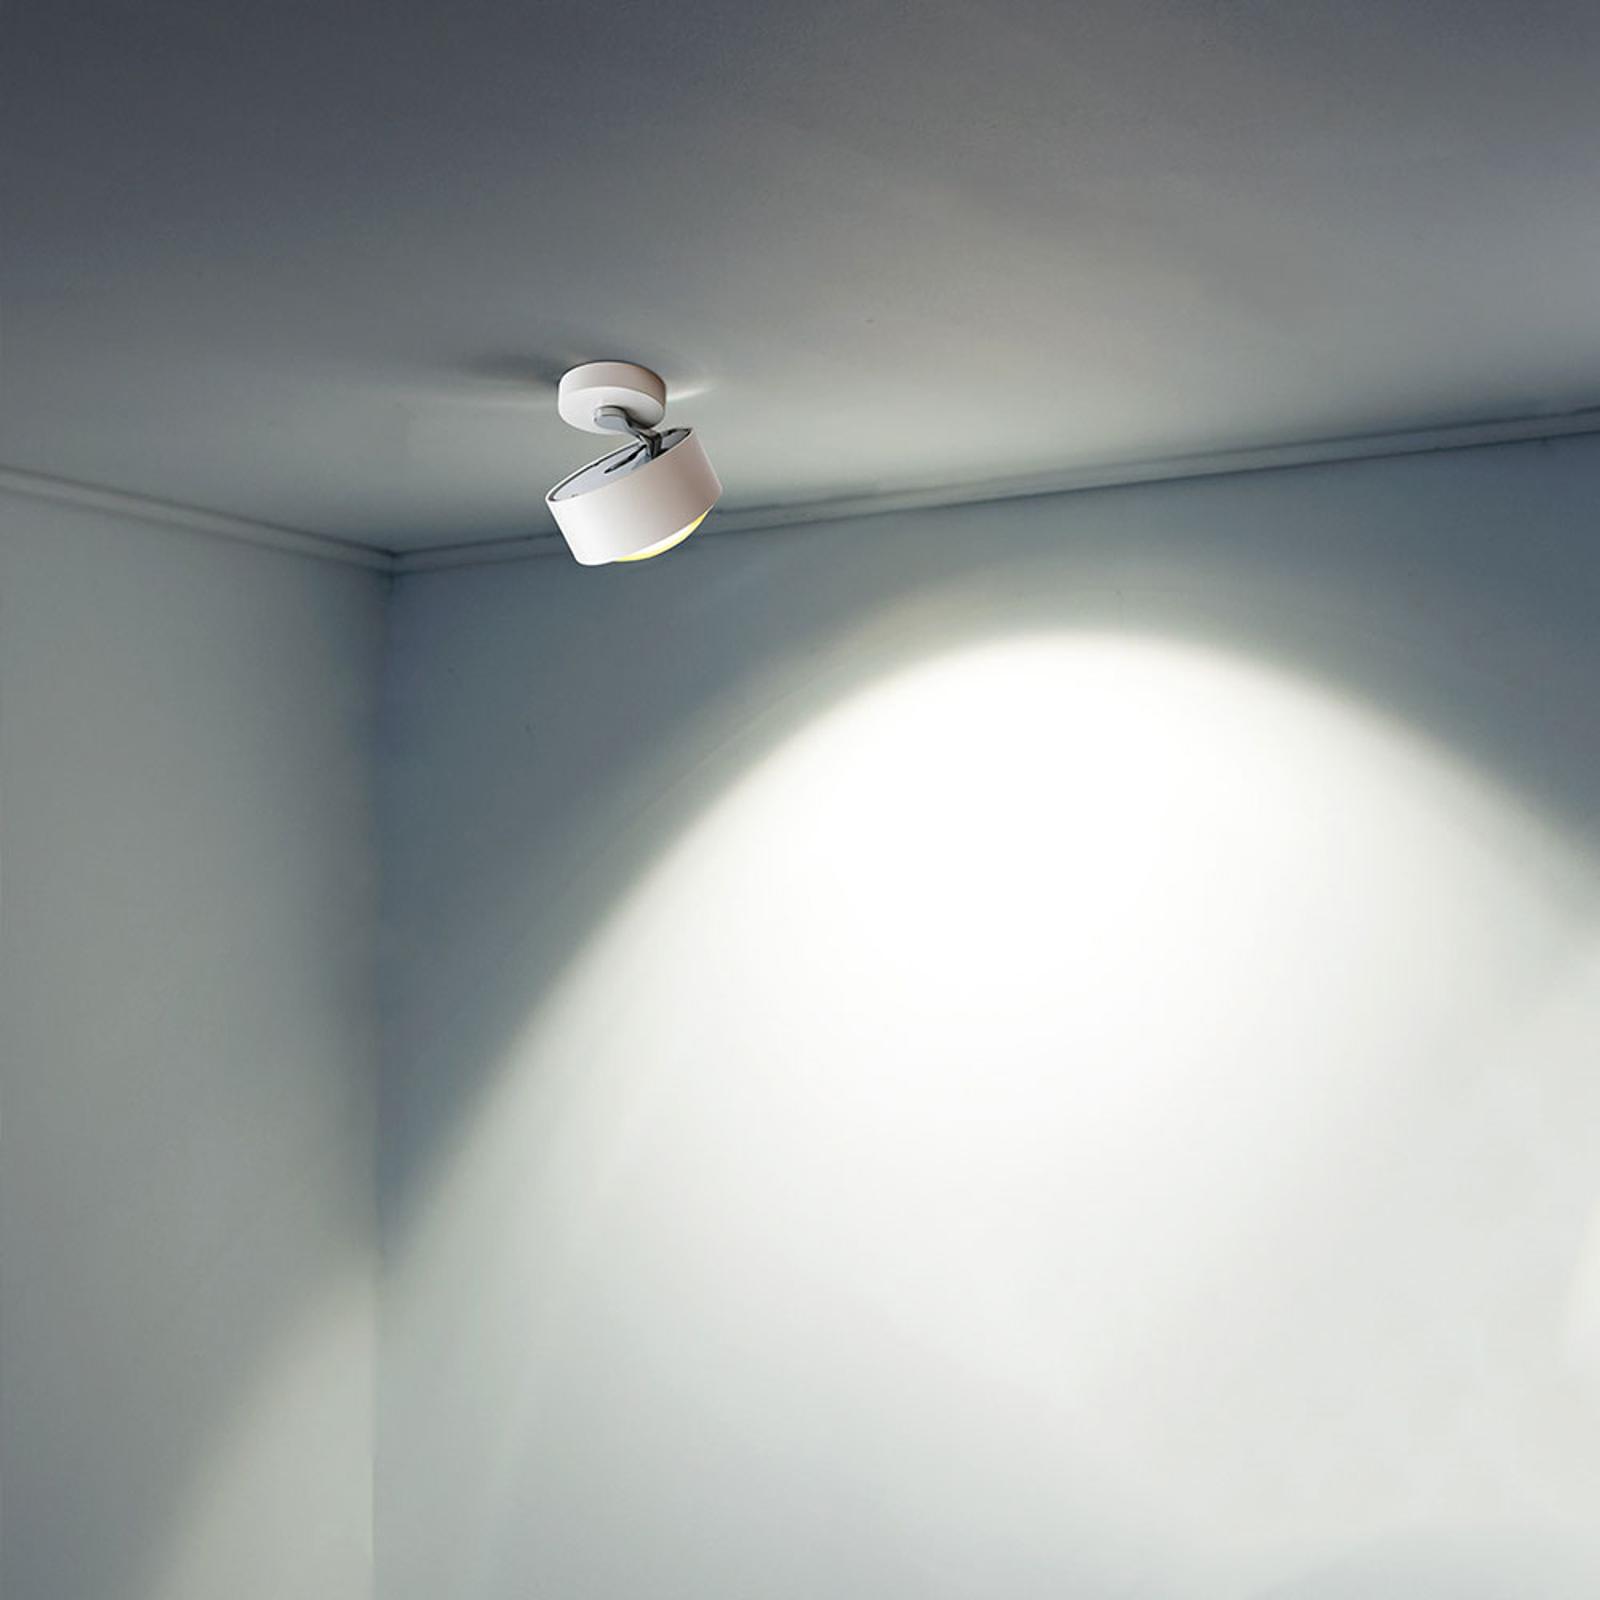 LED-Deckenlampe Puk Maxx Move, weiß chrom